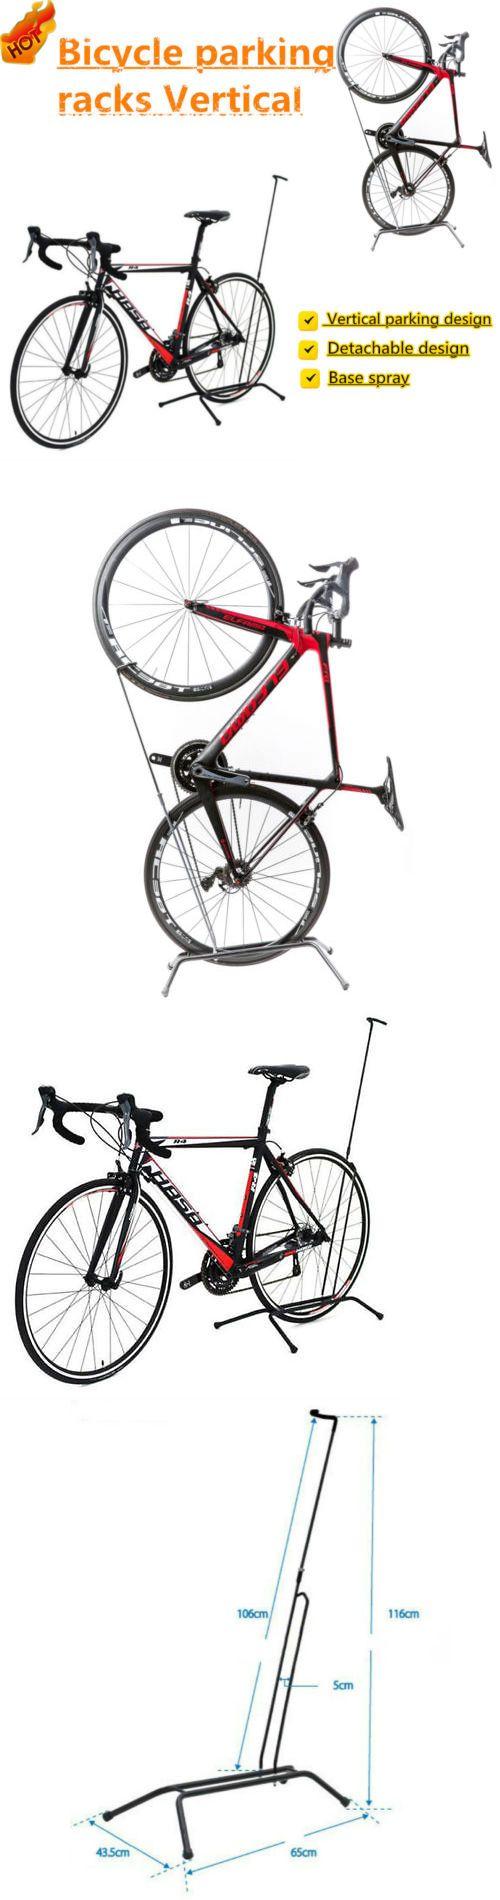 17 Best Ideas About Vertical Bike Rack On Pinterest Wall